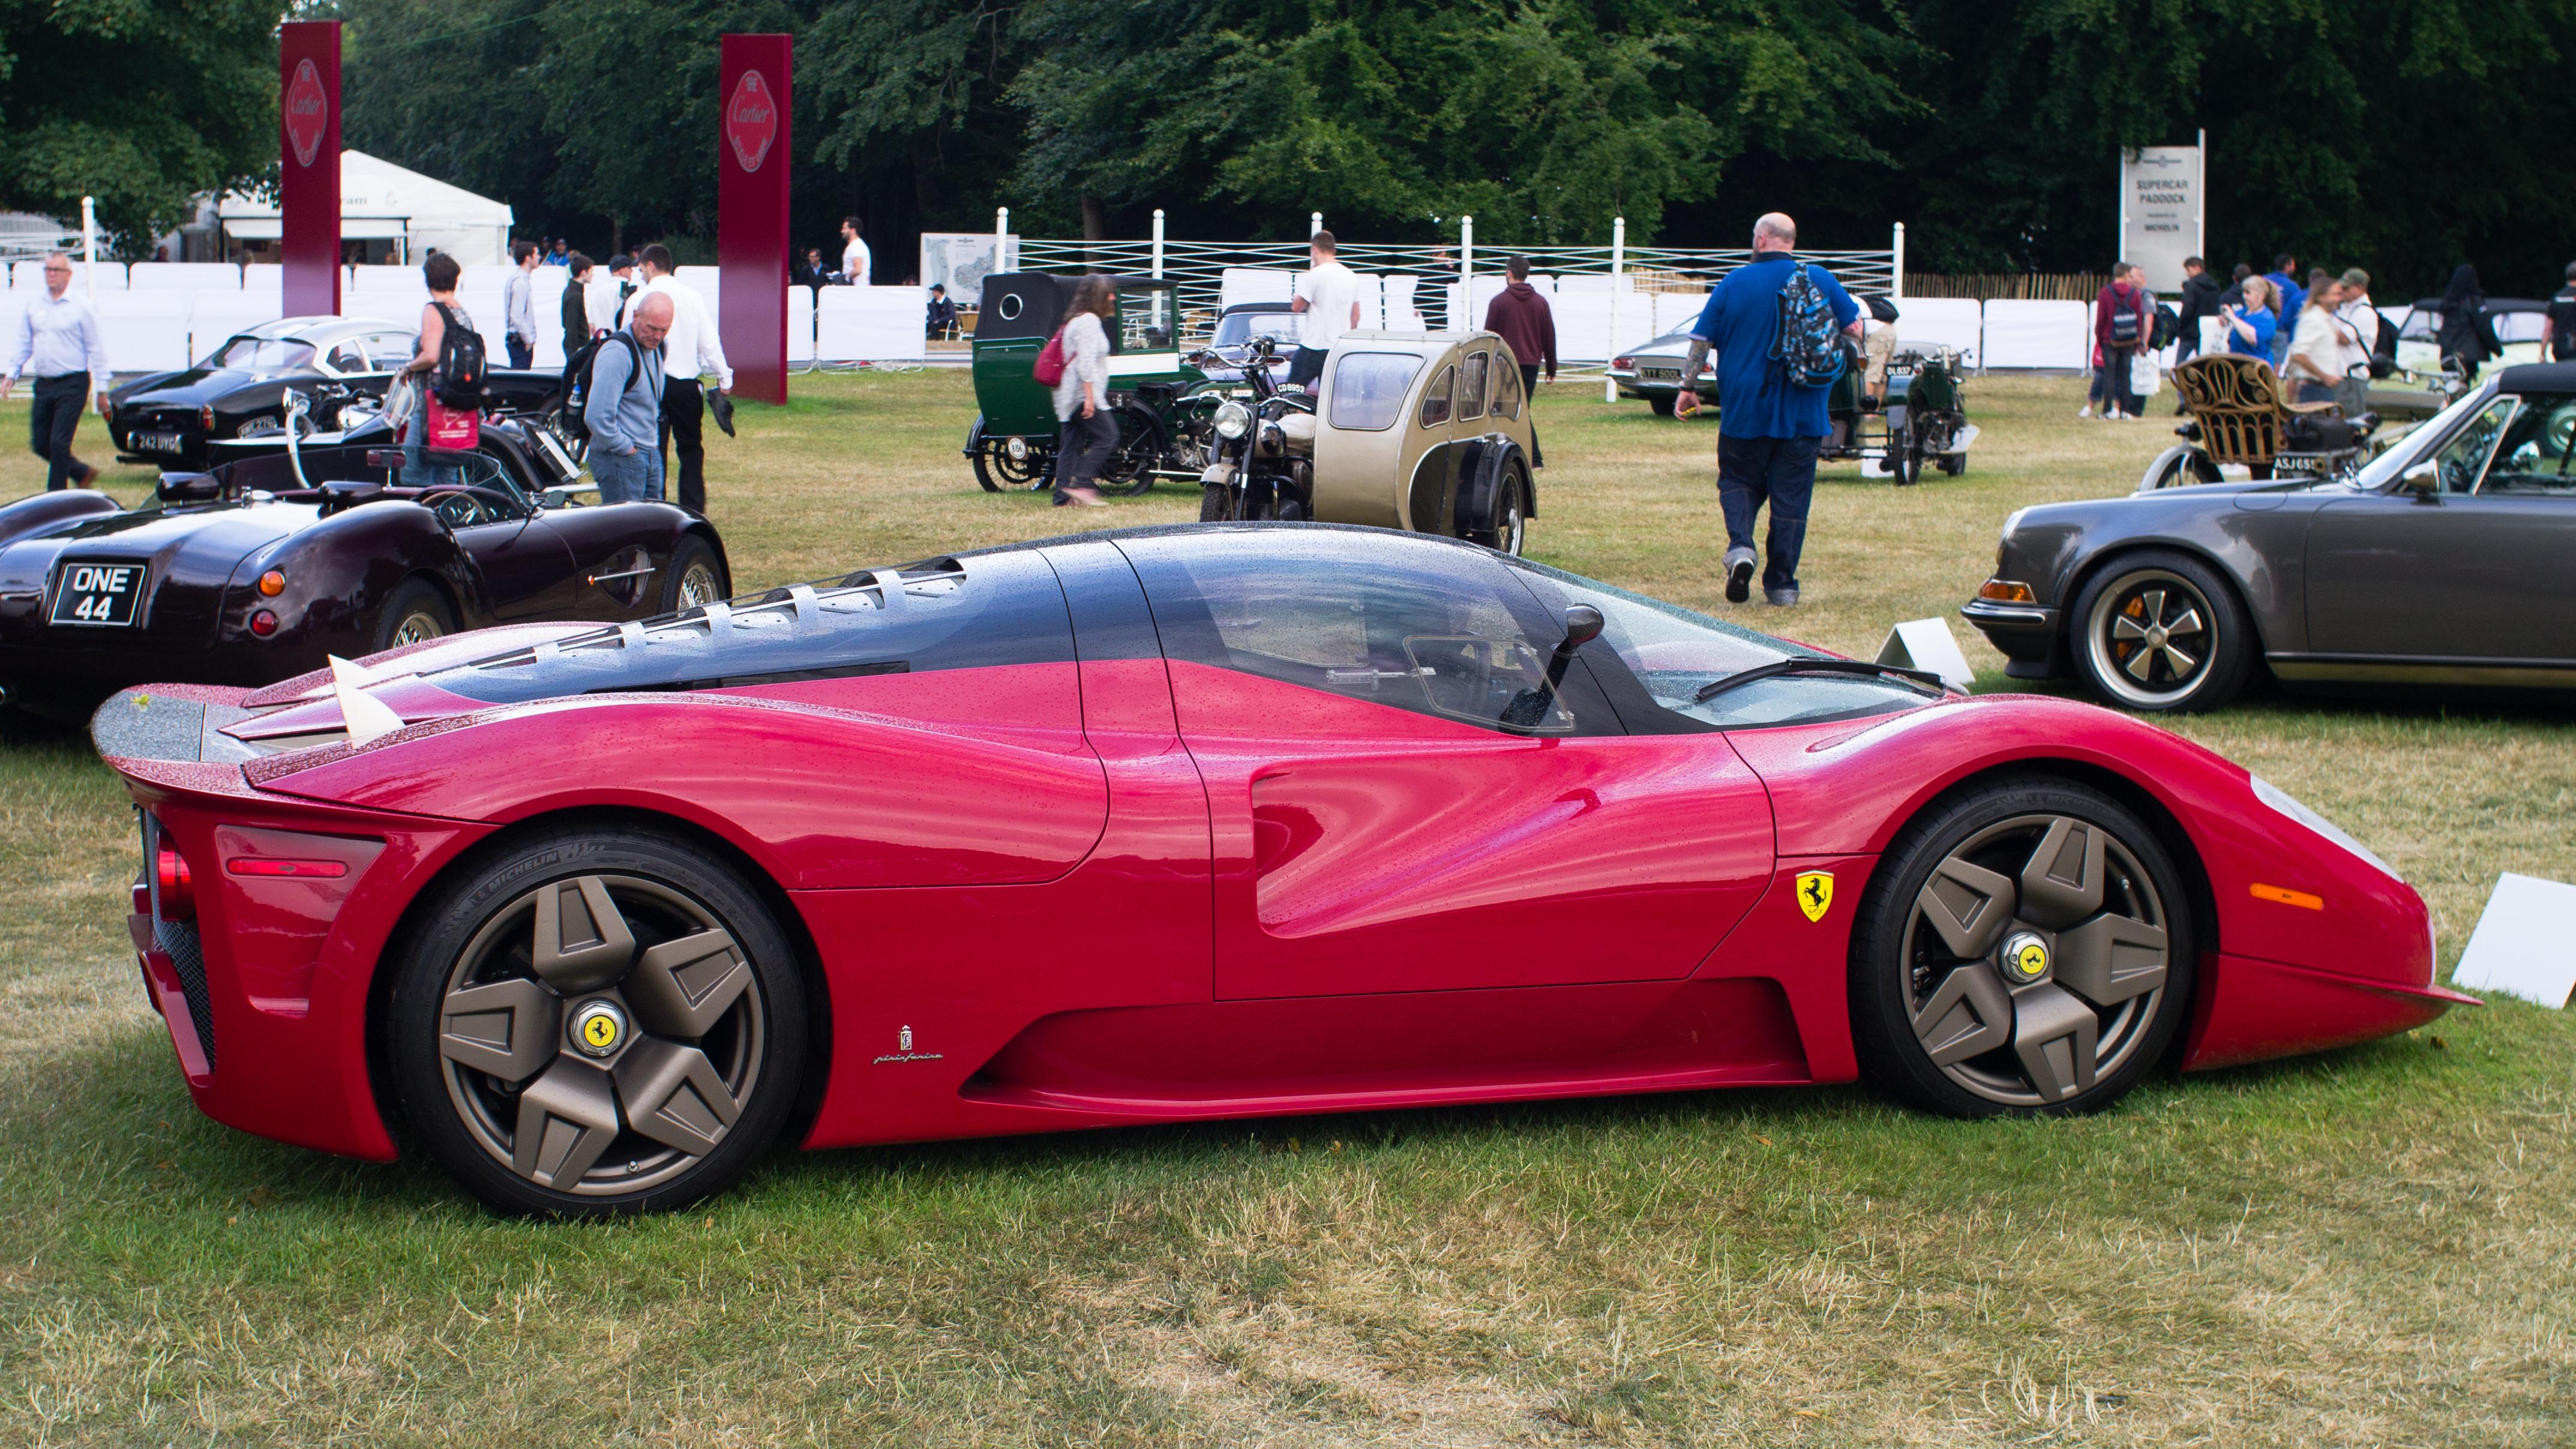 File:2006 Ferrari P45 by Pininfarina 19009965773.jpg  Wikipedia